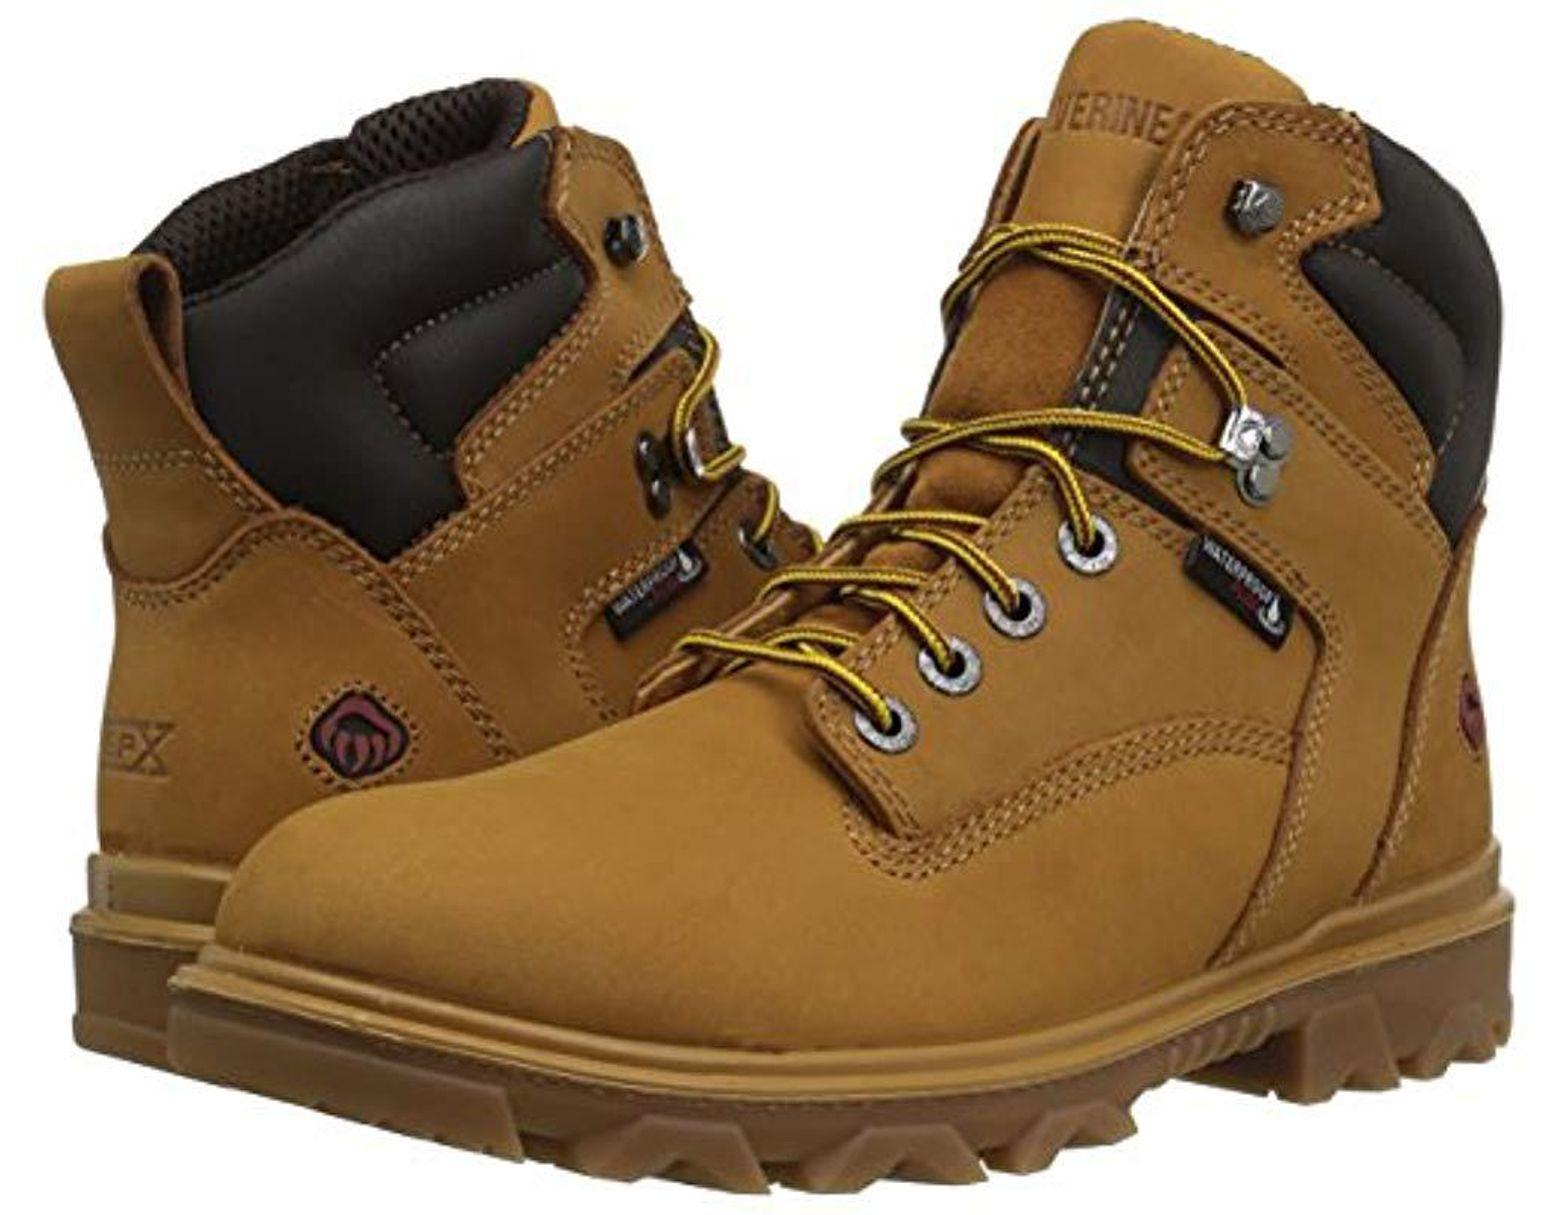 35faea6373d Men's Brown I-90 Epx